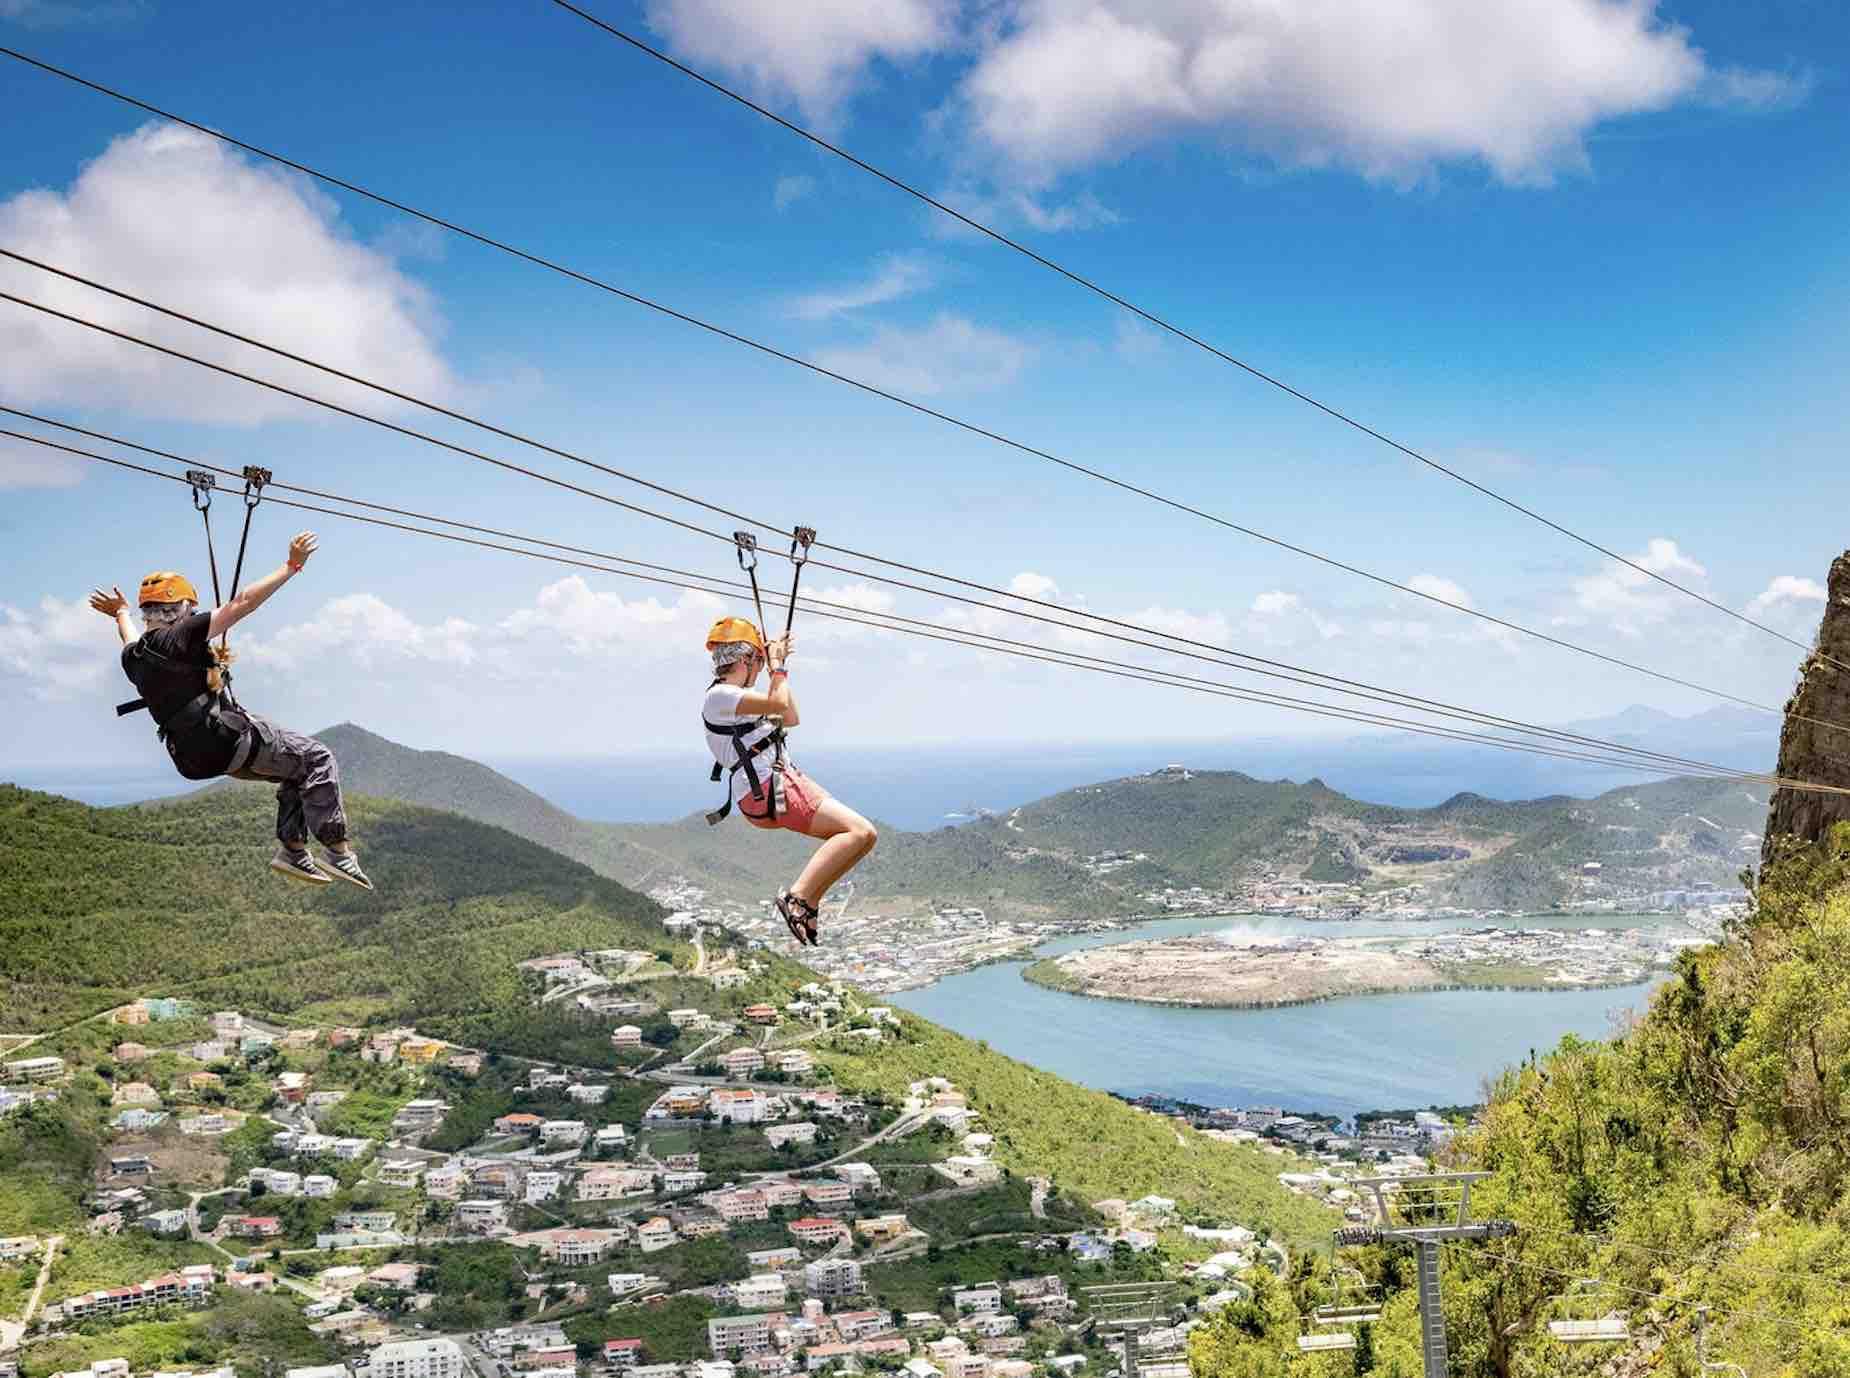 Ziplining with Rainforest Adventures